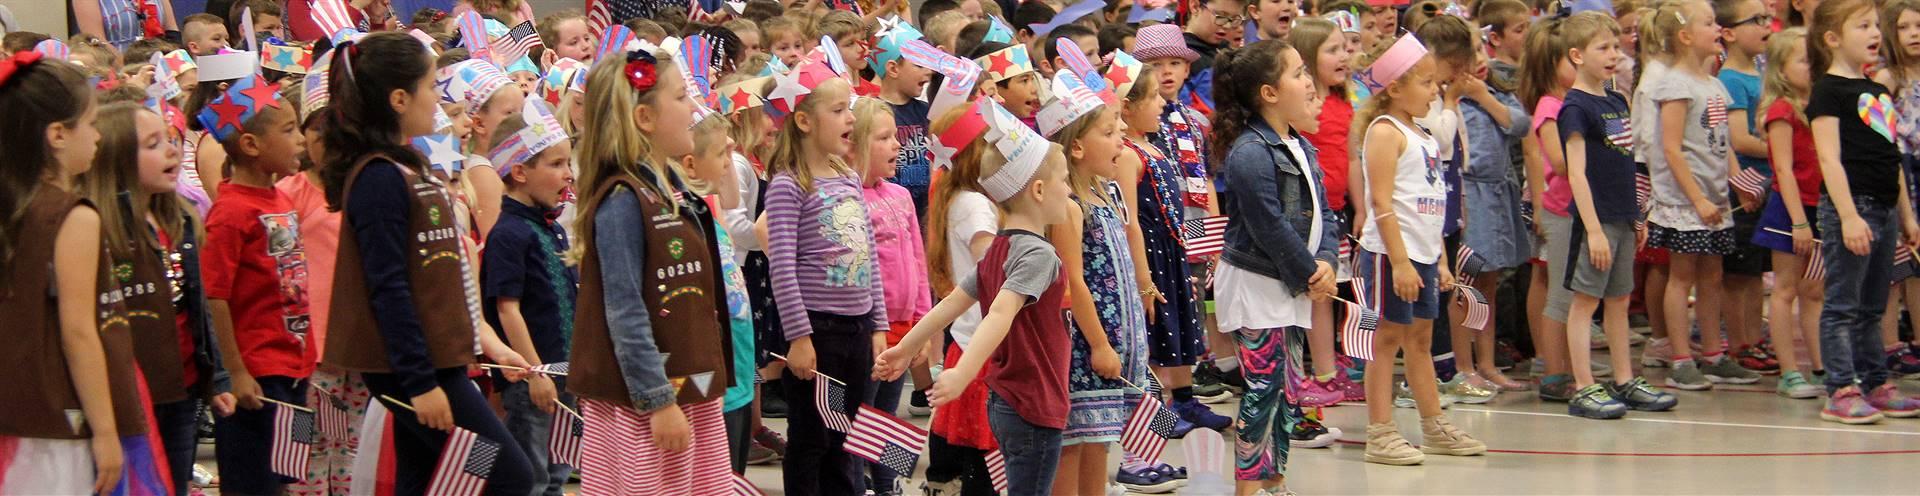 Port Dickinson Elementary Flag Day Ceremony Photo 56